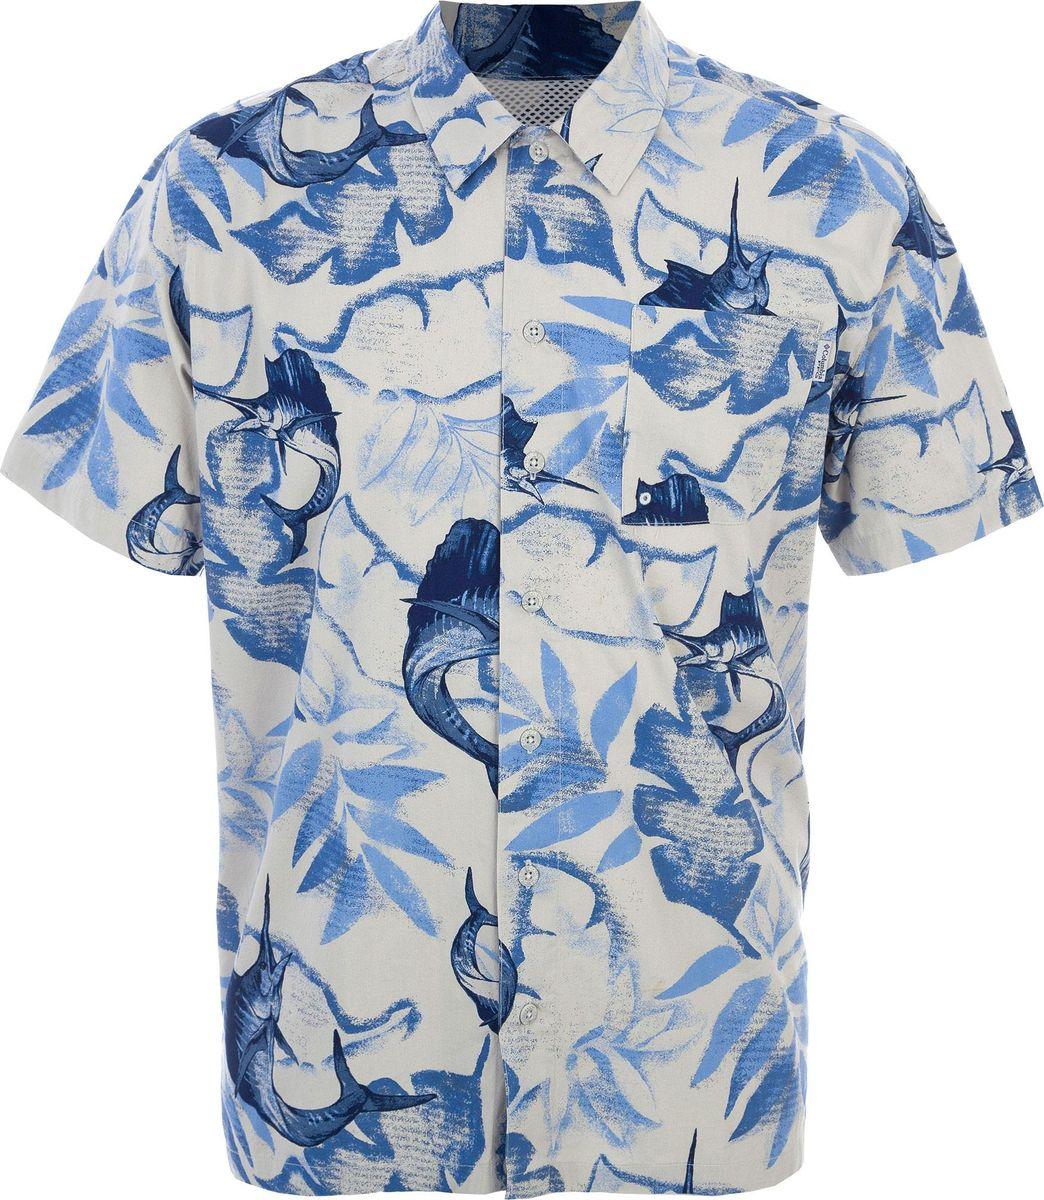 Рубашка Columbia рубашка мужская columbia tamiami ii ss shirt цвет бежевый 1287051 160 размер xl 52 54